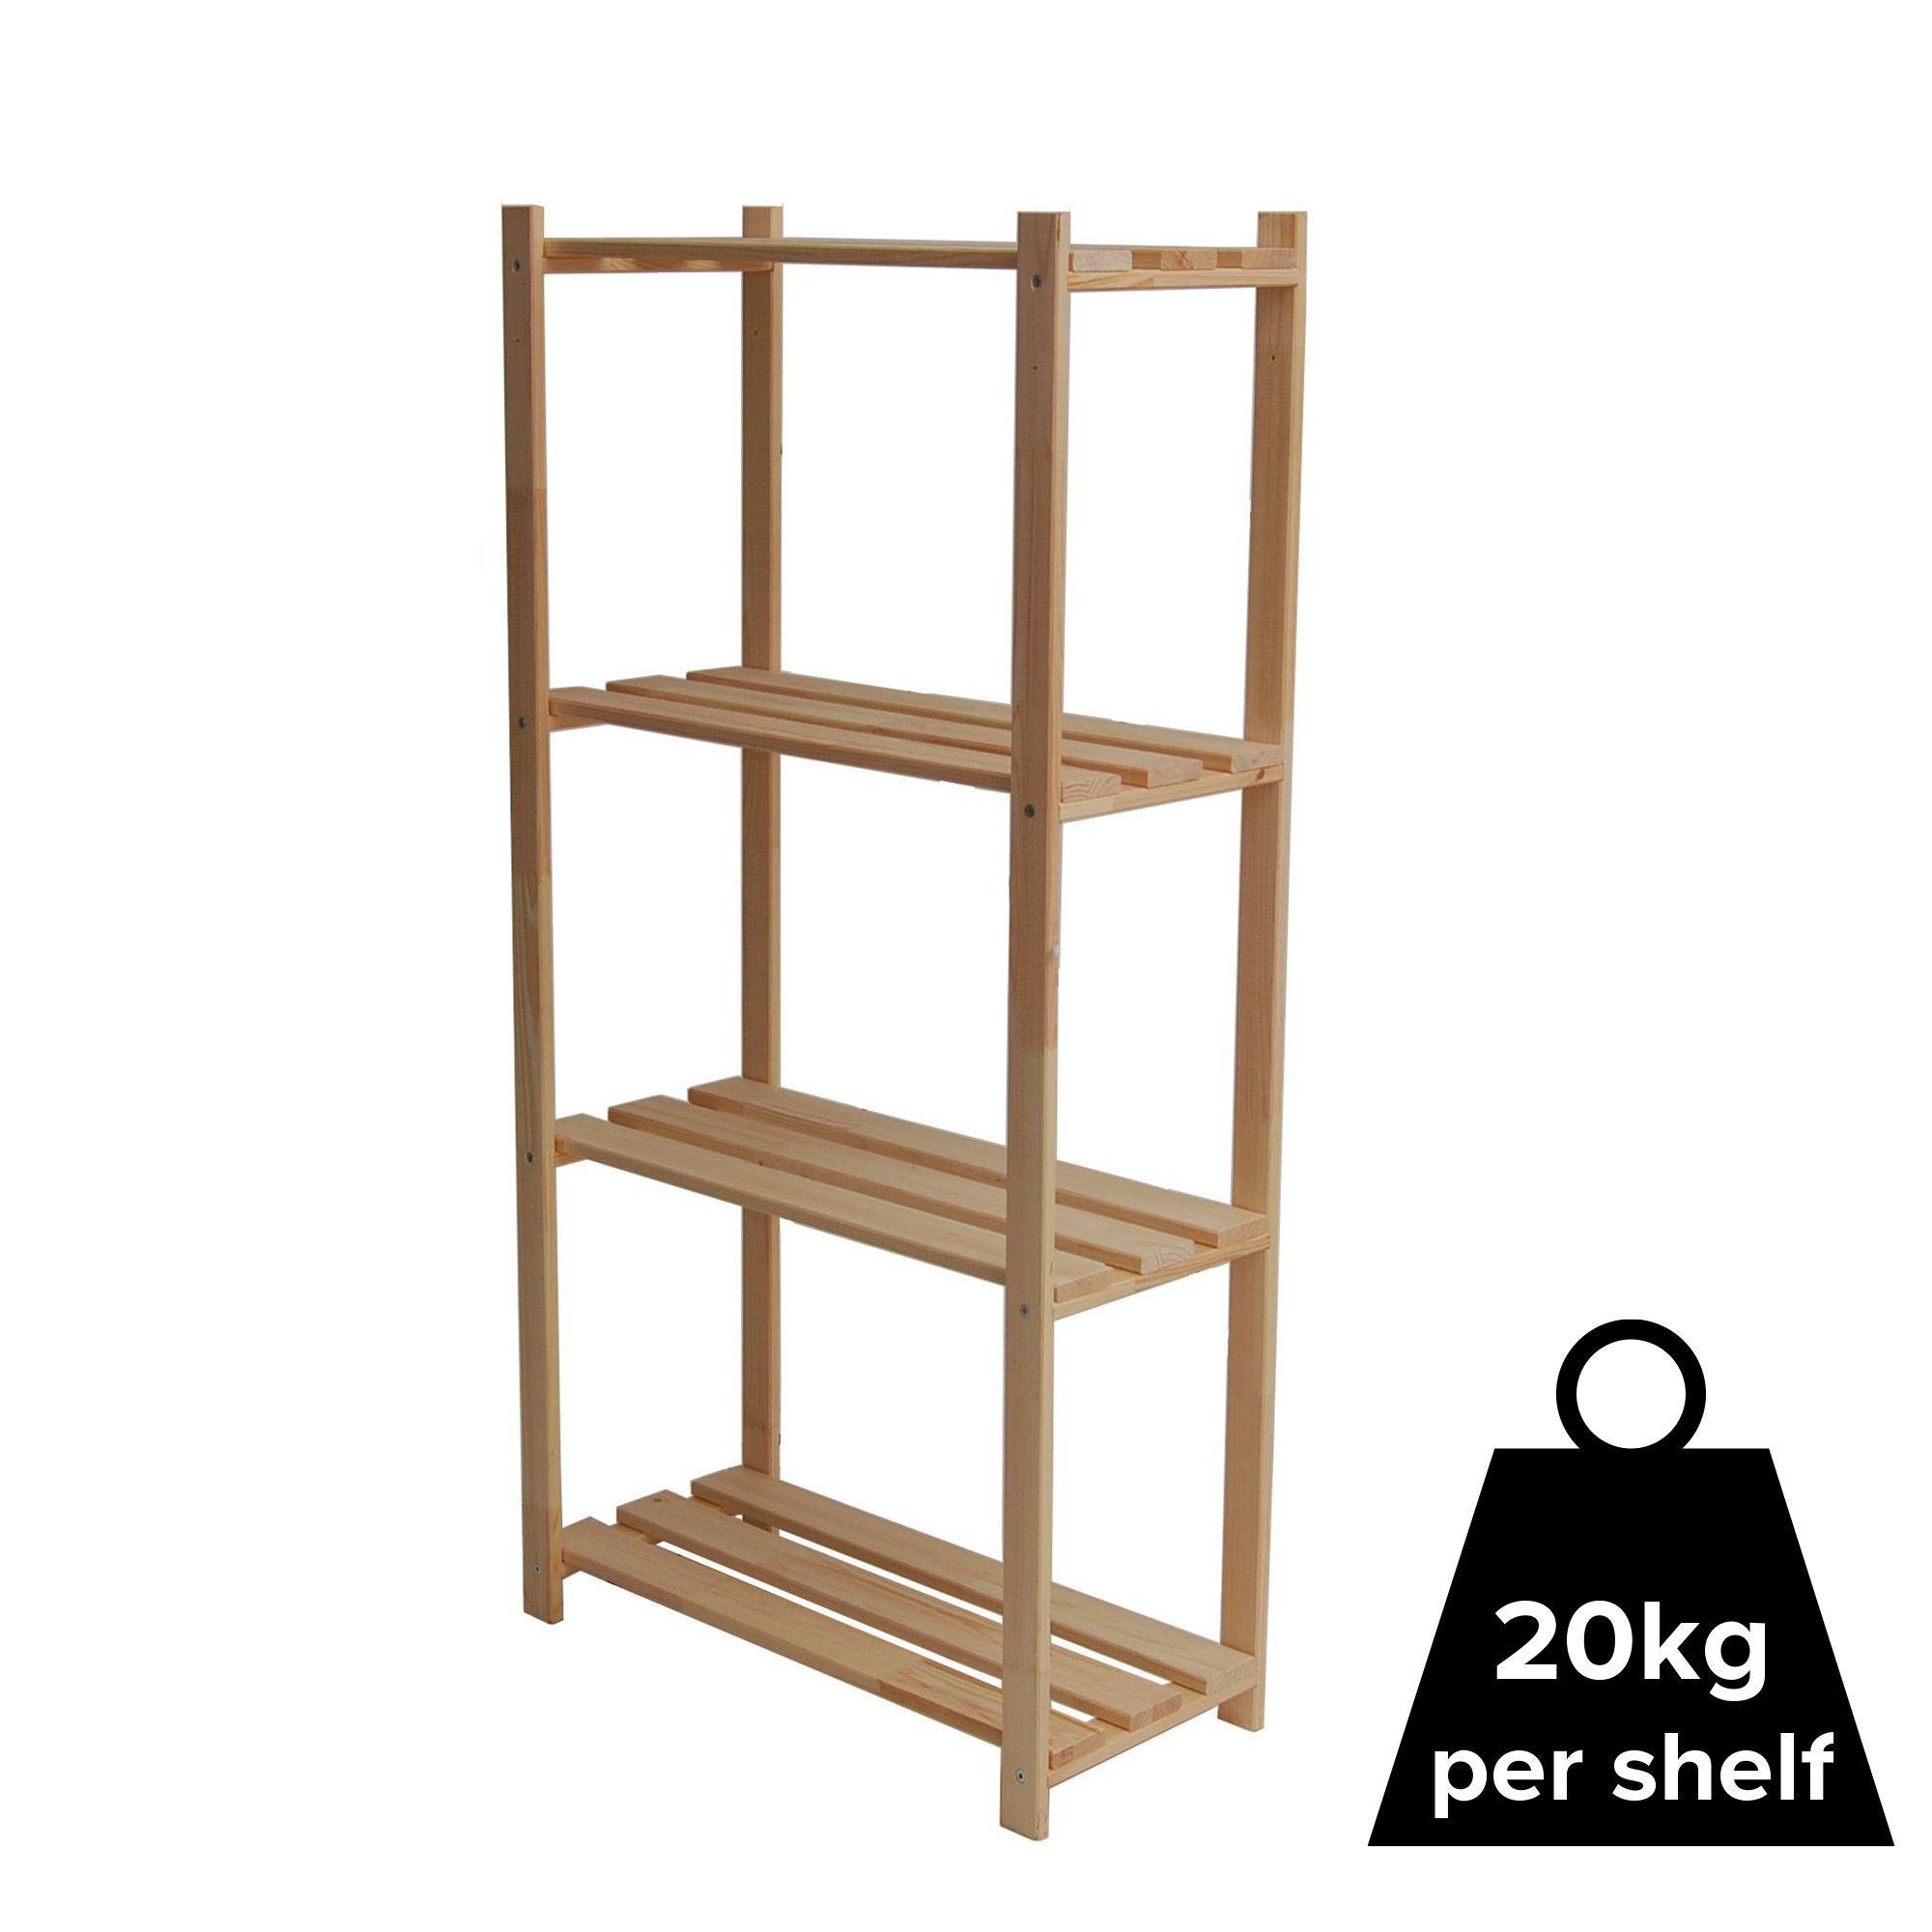 Diy Shelving Unit: 4 Shelf Wood Shelving Unit